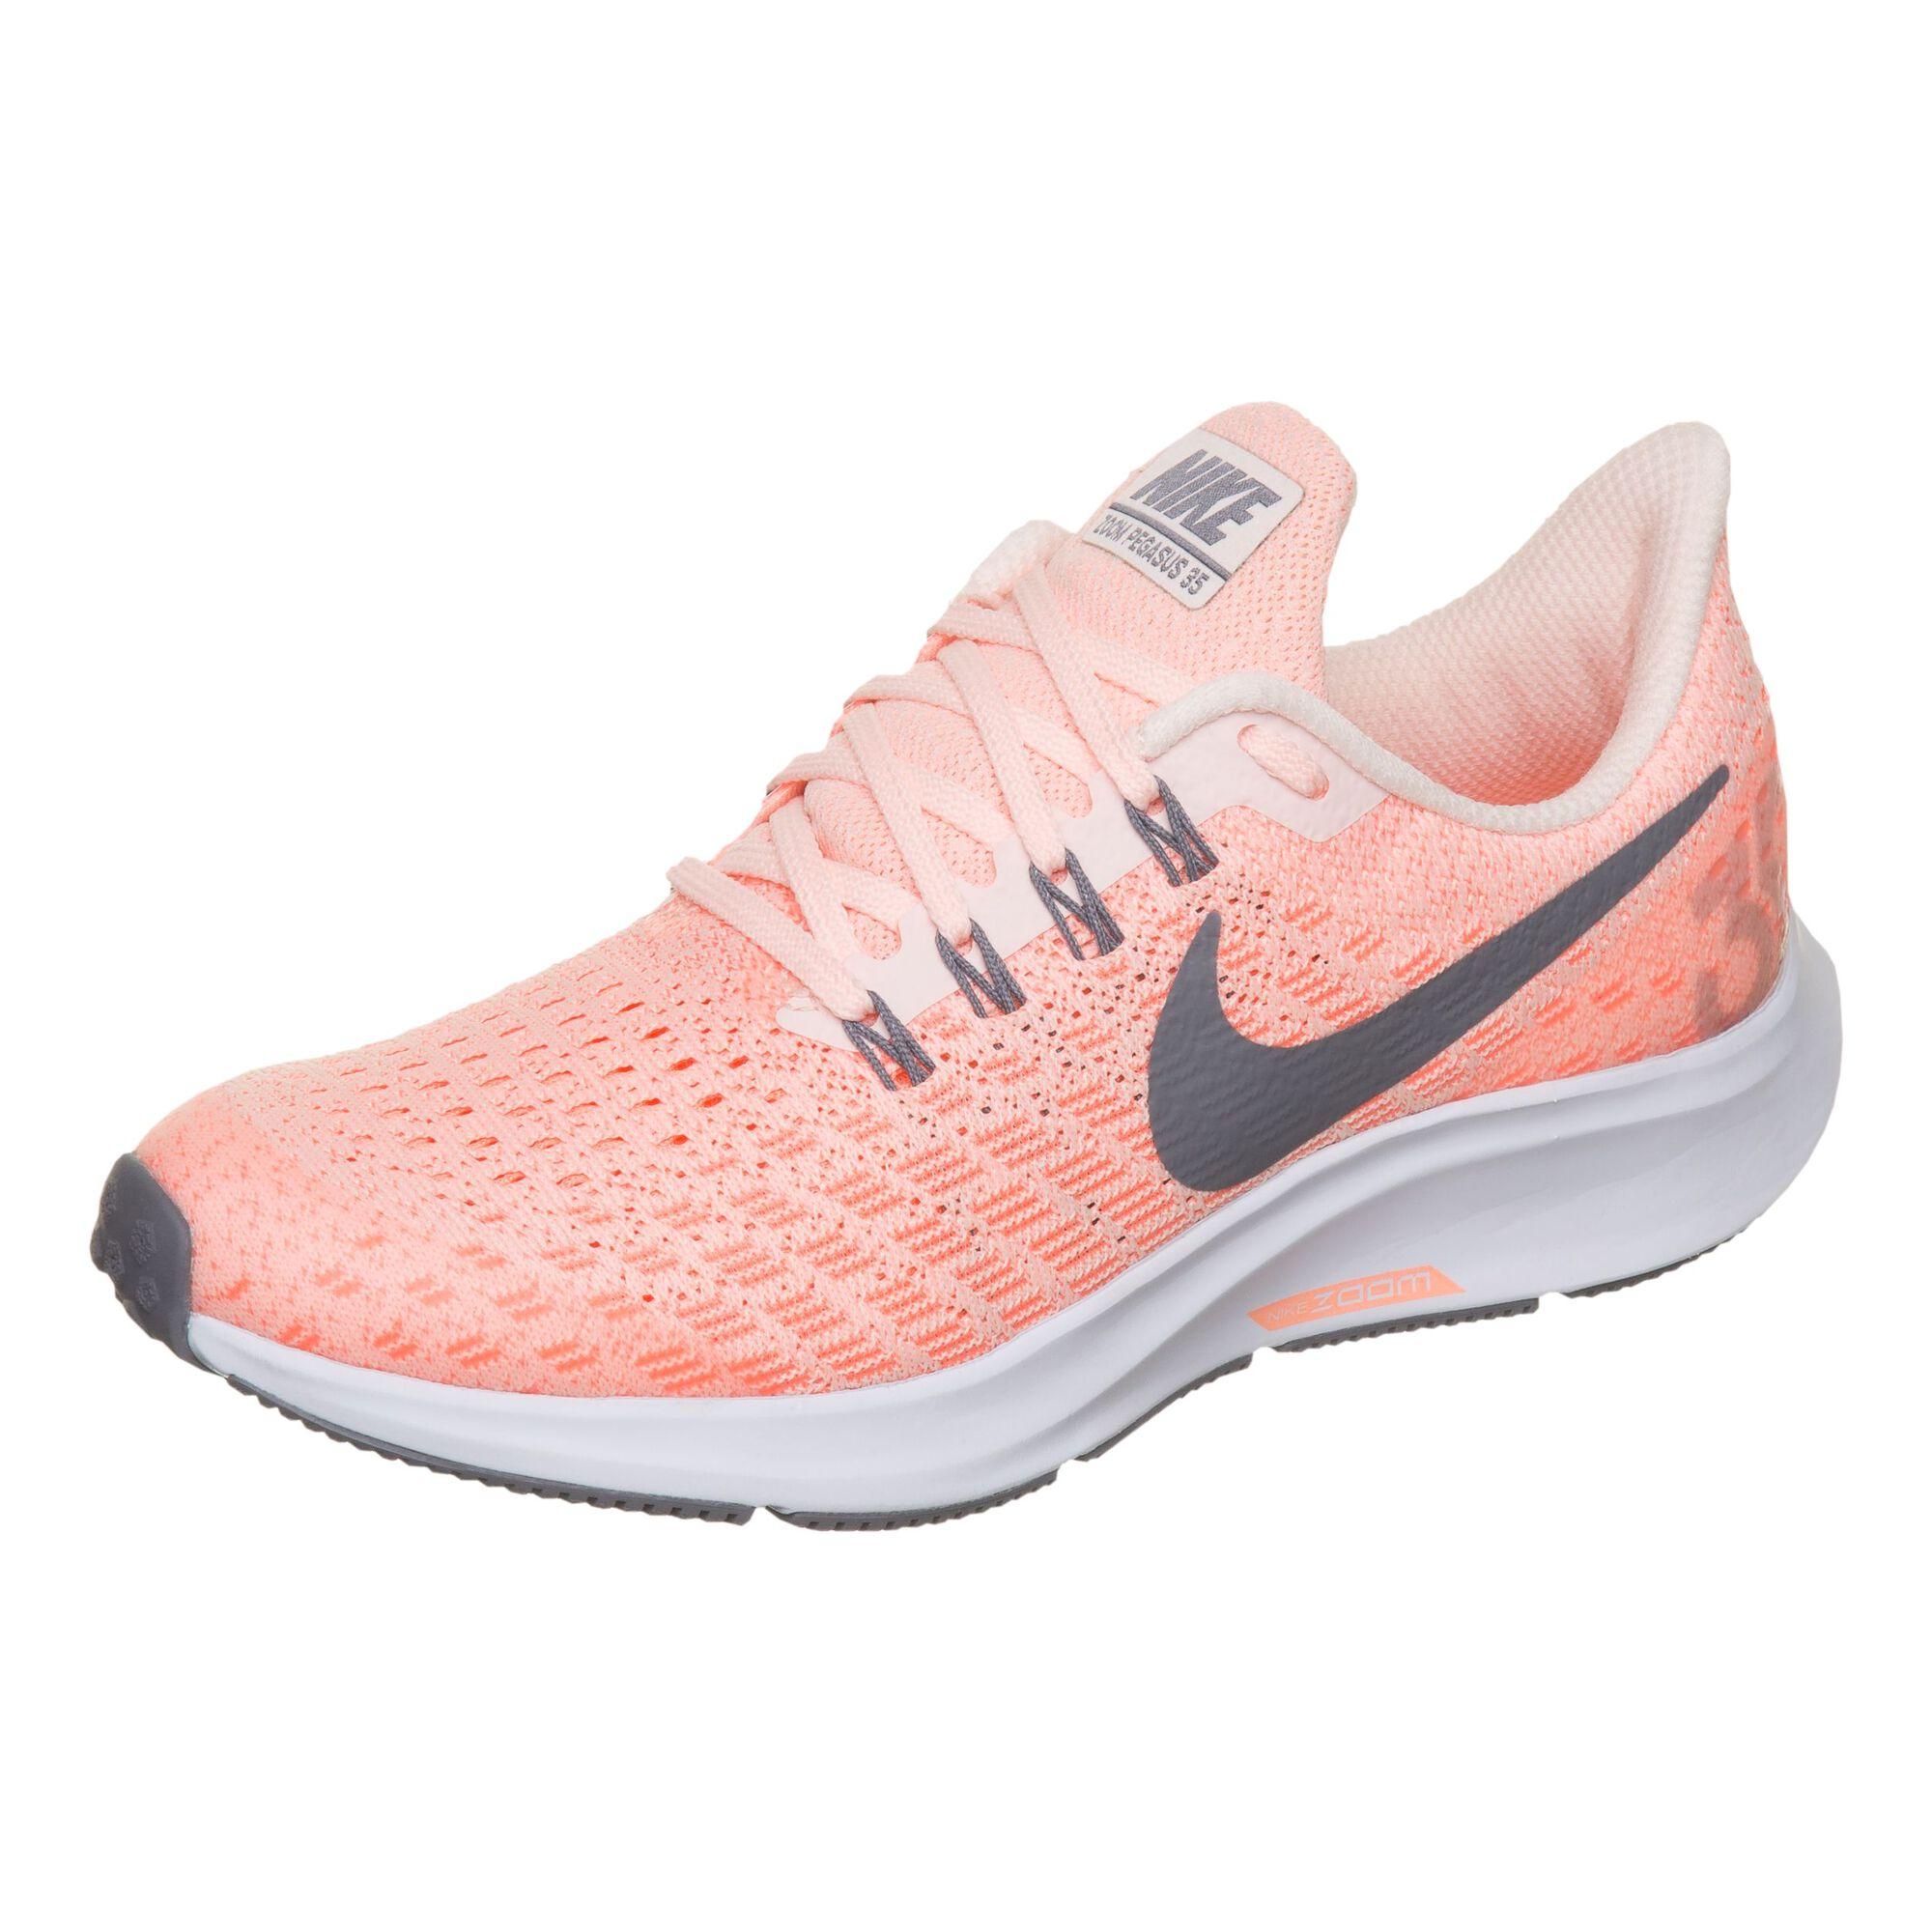 f61b478056da9 Nike  Nike  Nike  Nike  Nike  Nike  Nike  Nike  Nike  Nike. Air Zoom  Pegasus 35 GS Kids ...